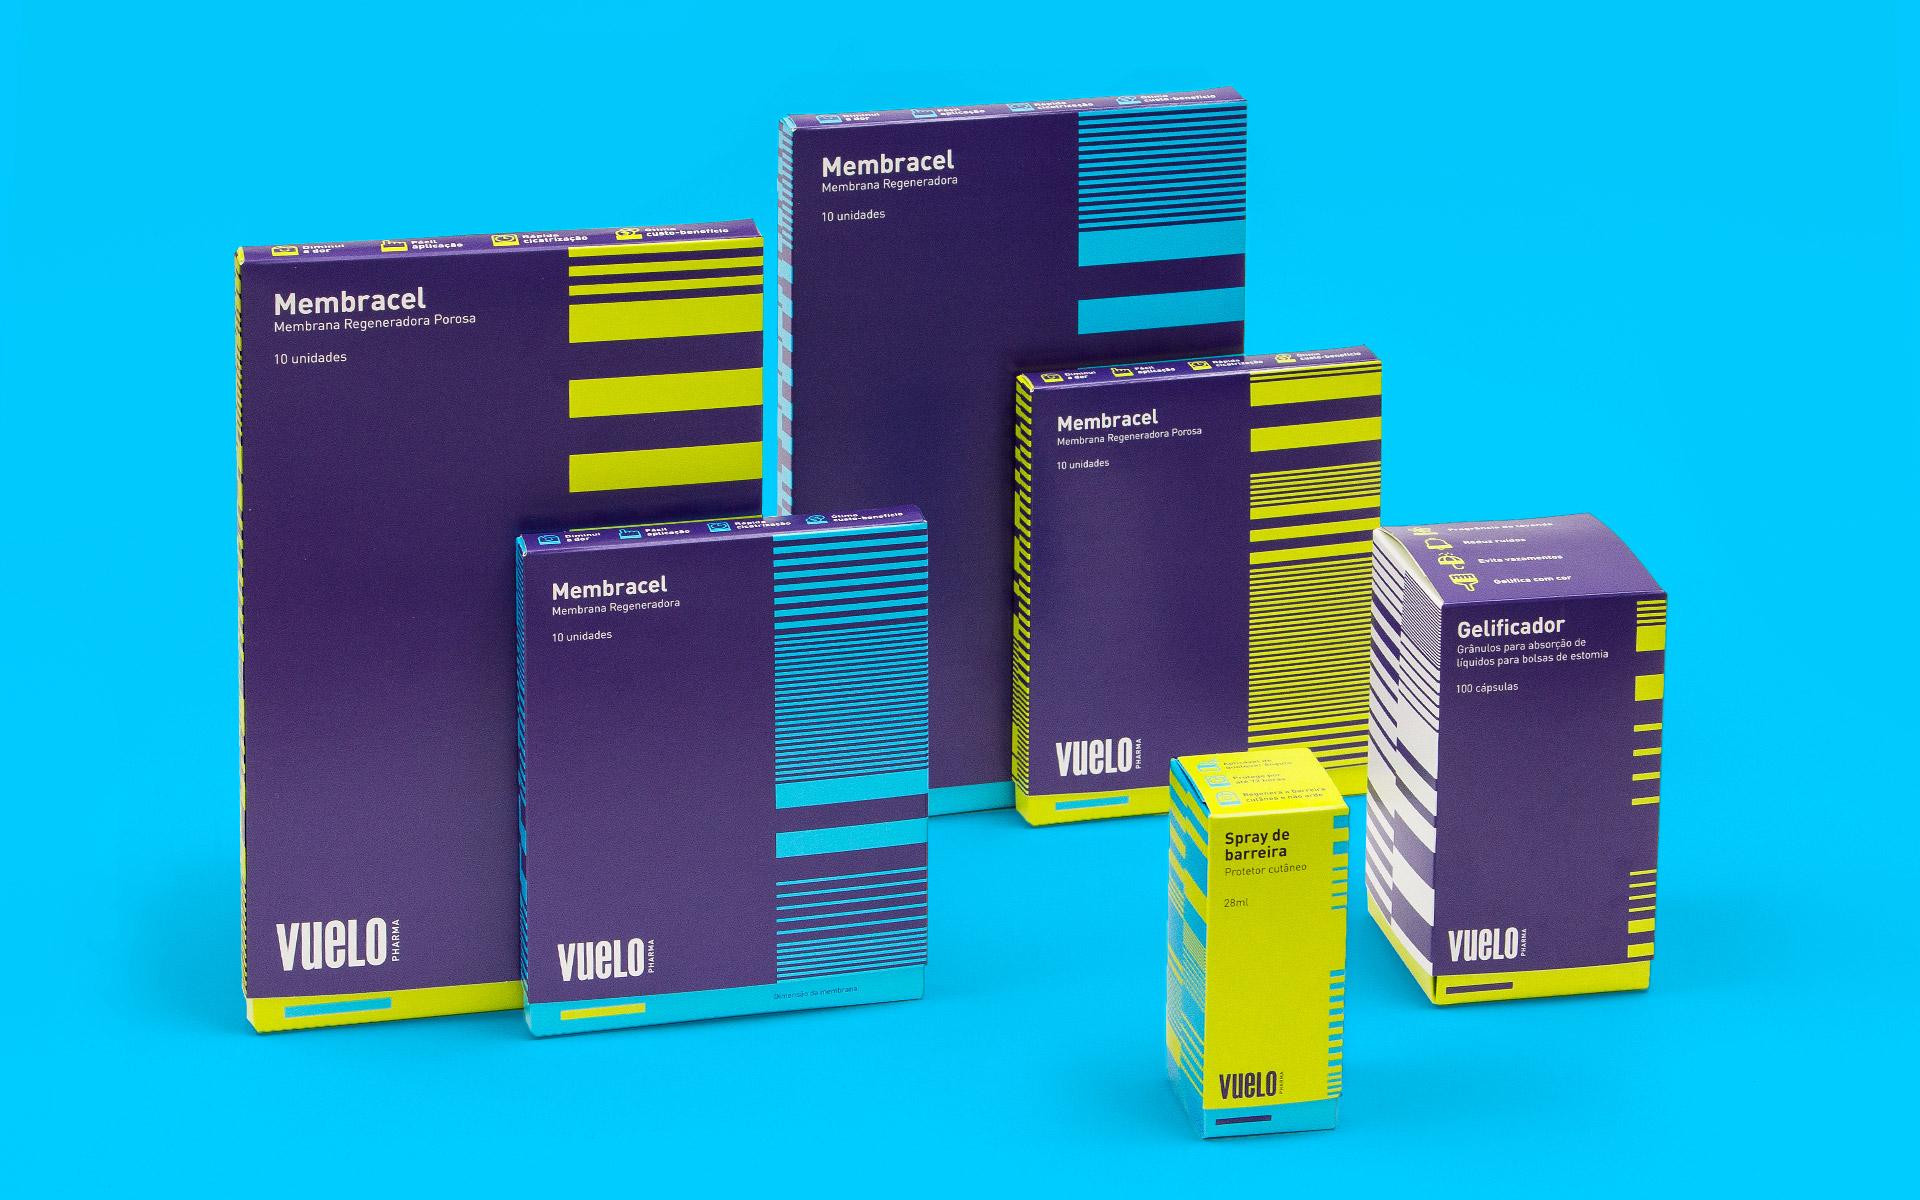 branding-design-embalagem-vuelo5